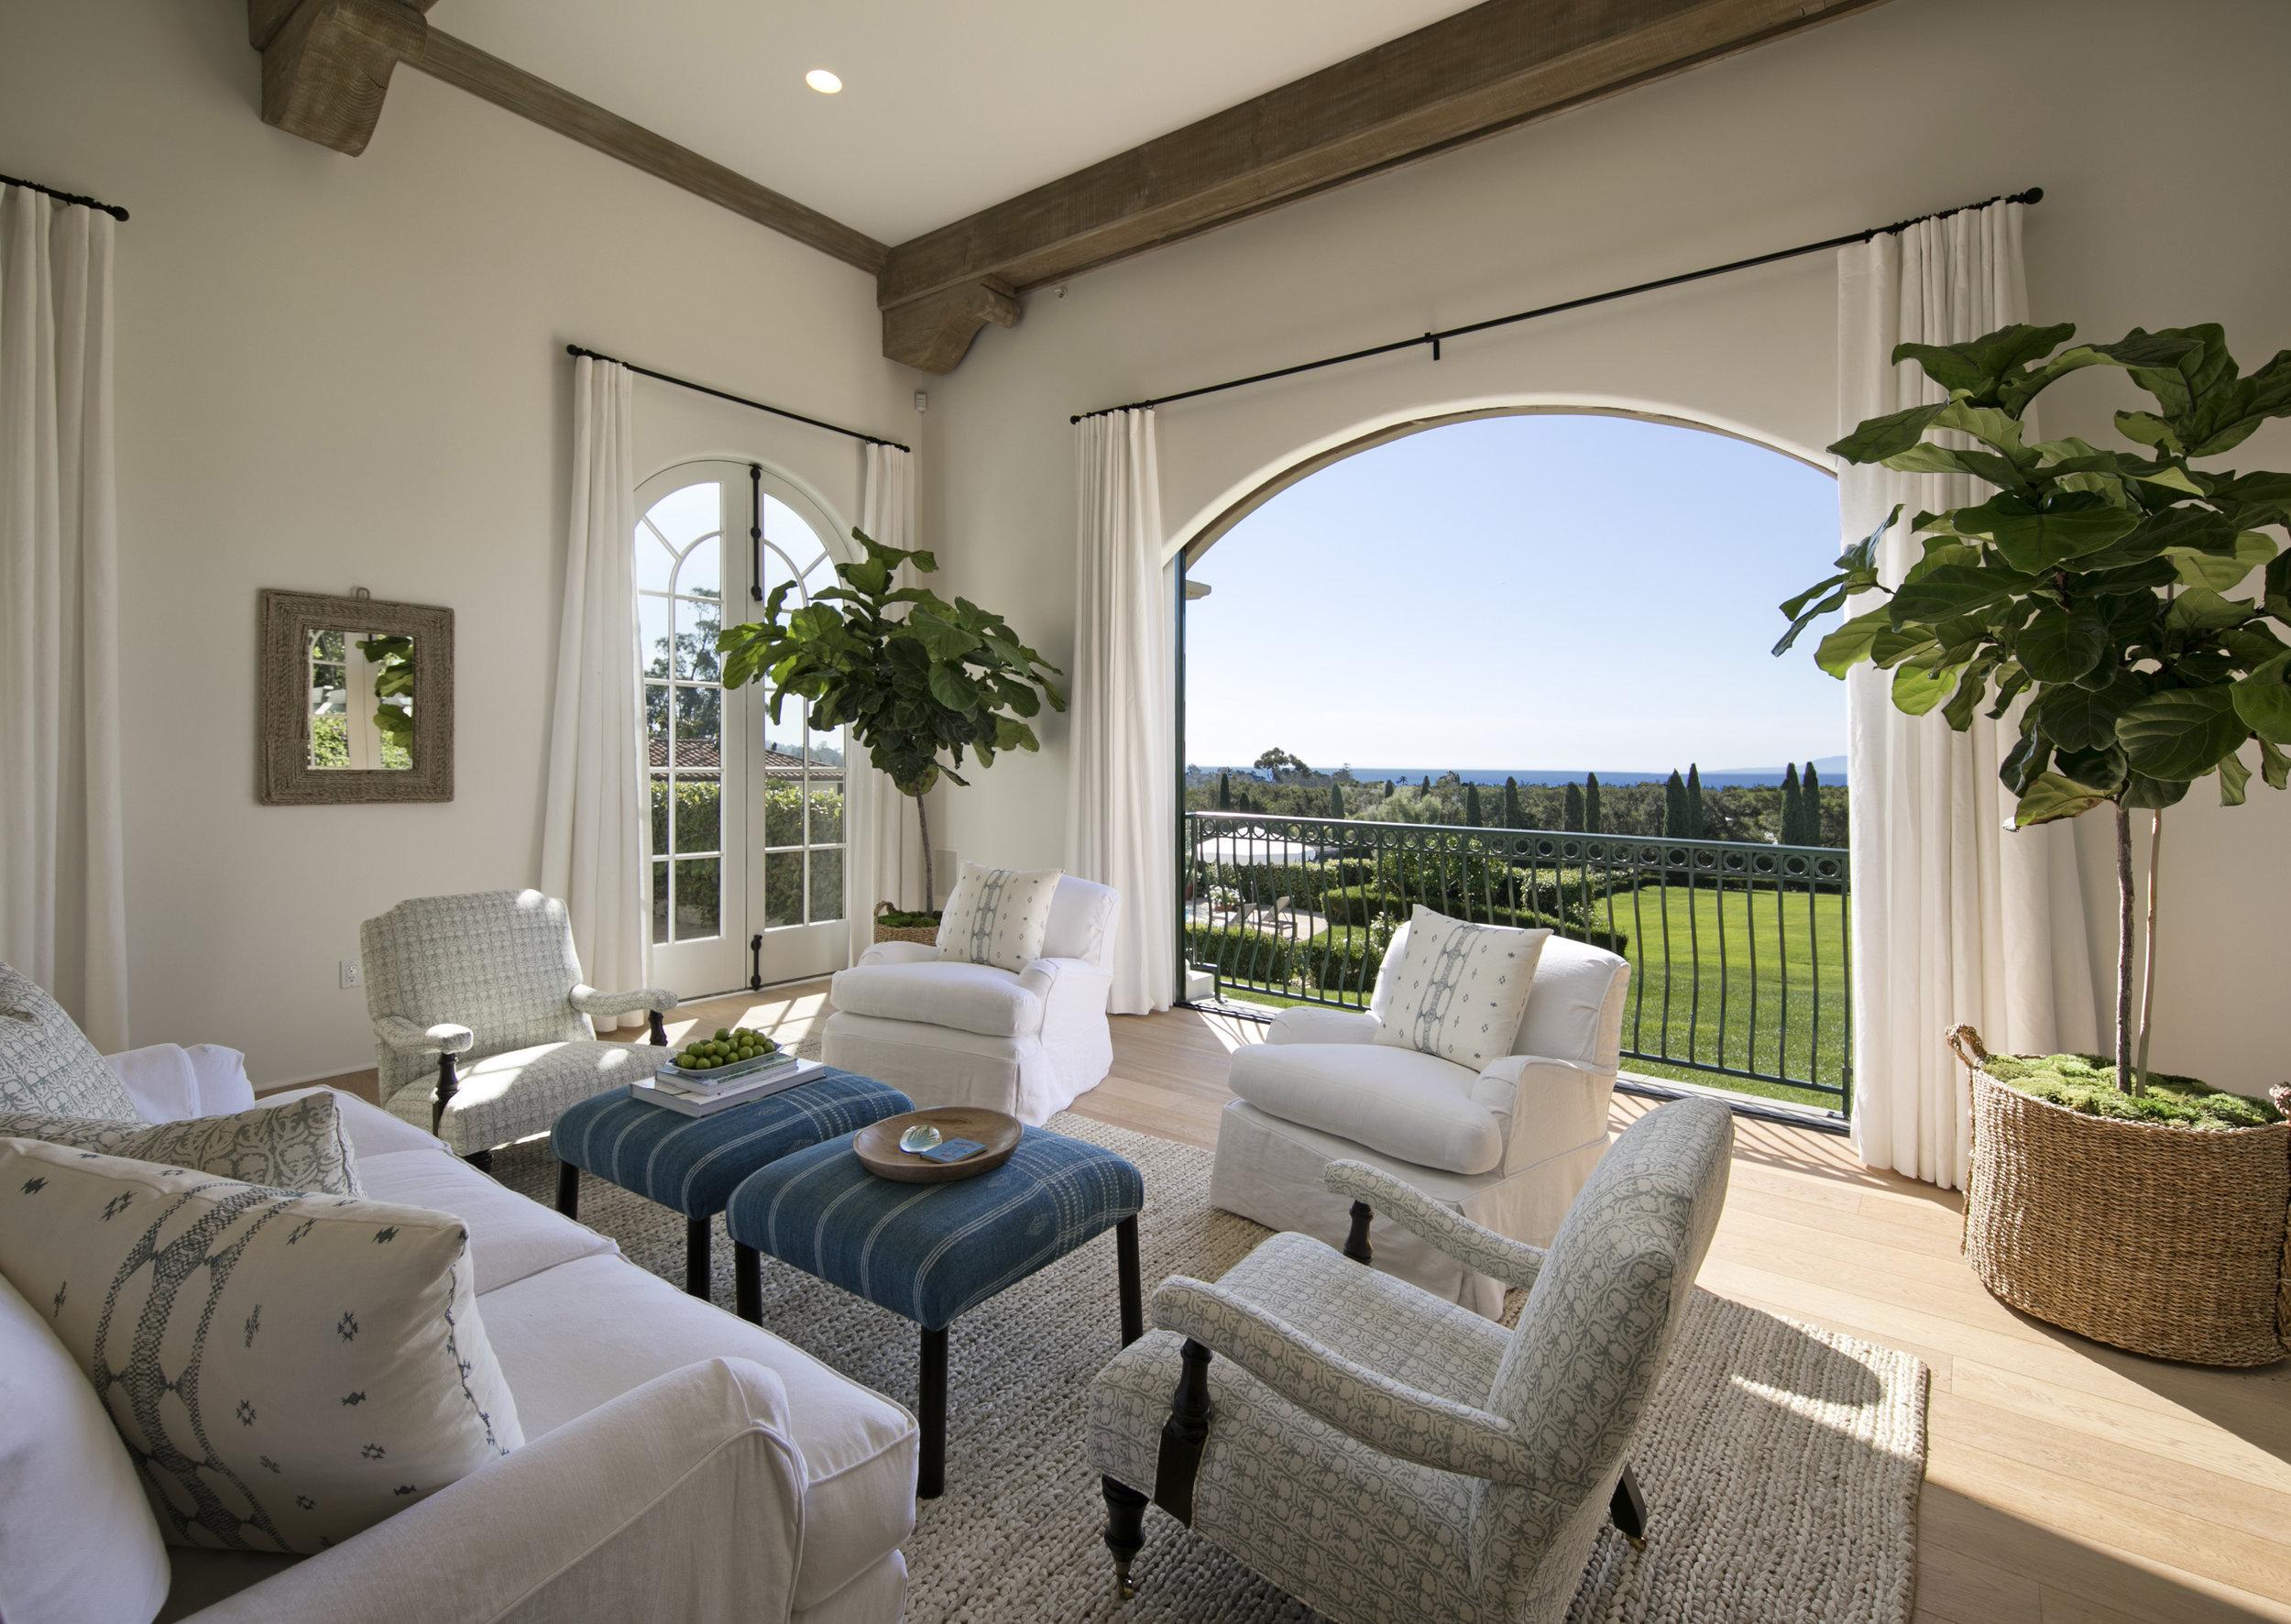 Rooms+Gardens+interior+design+sag+harbor+chair.jpeg